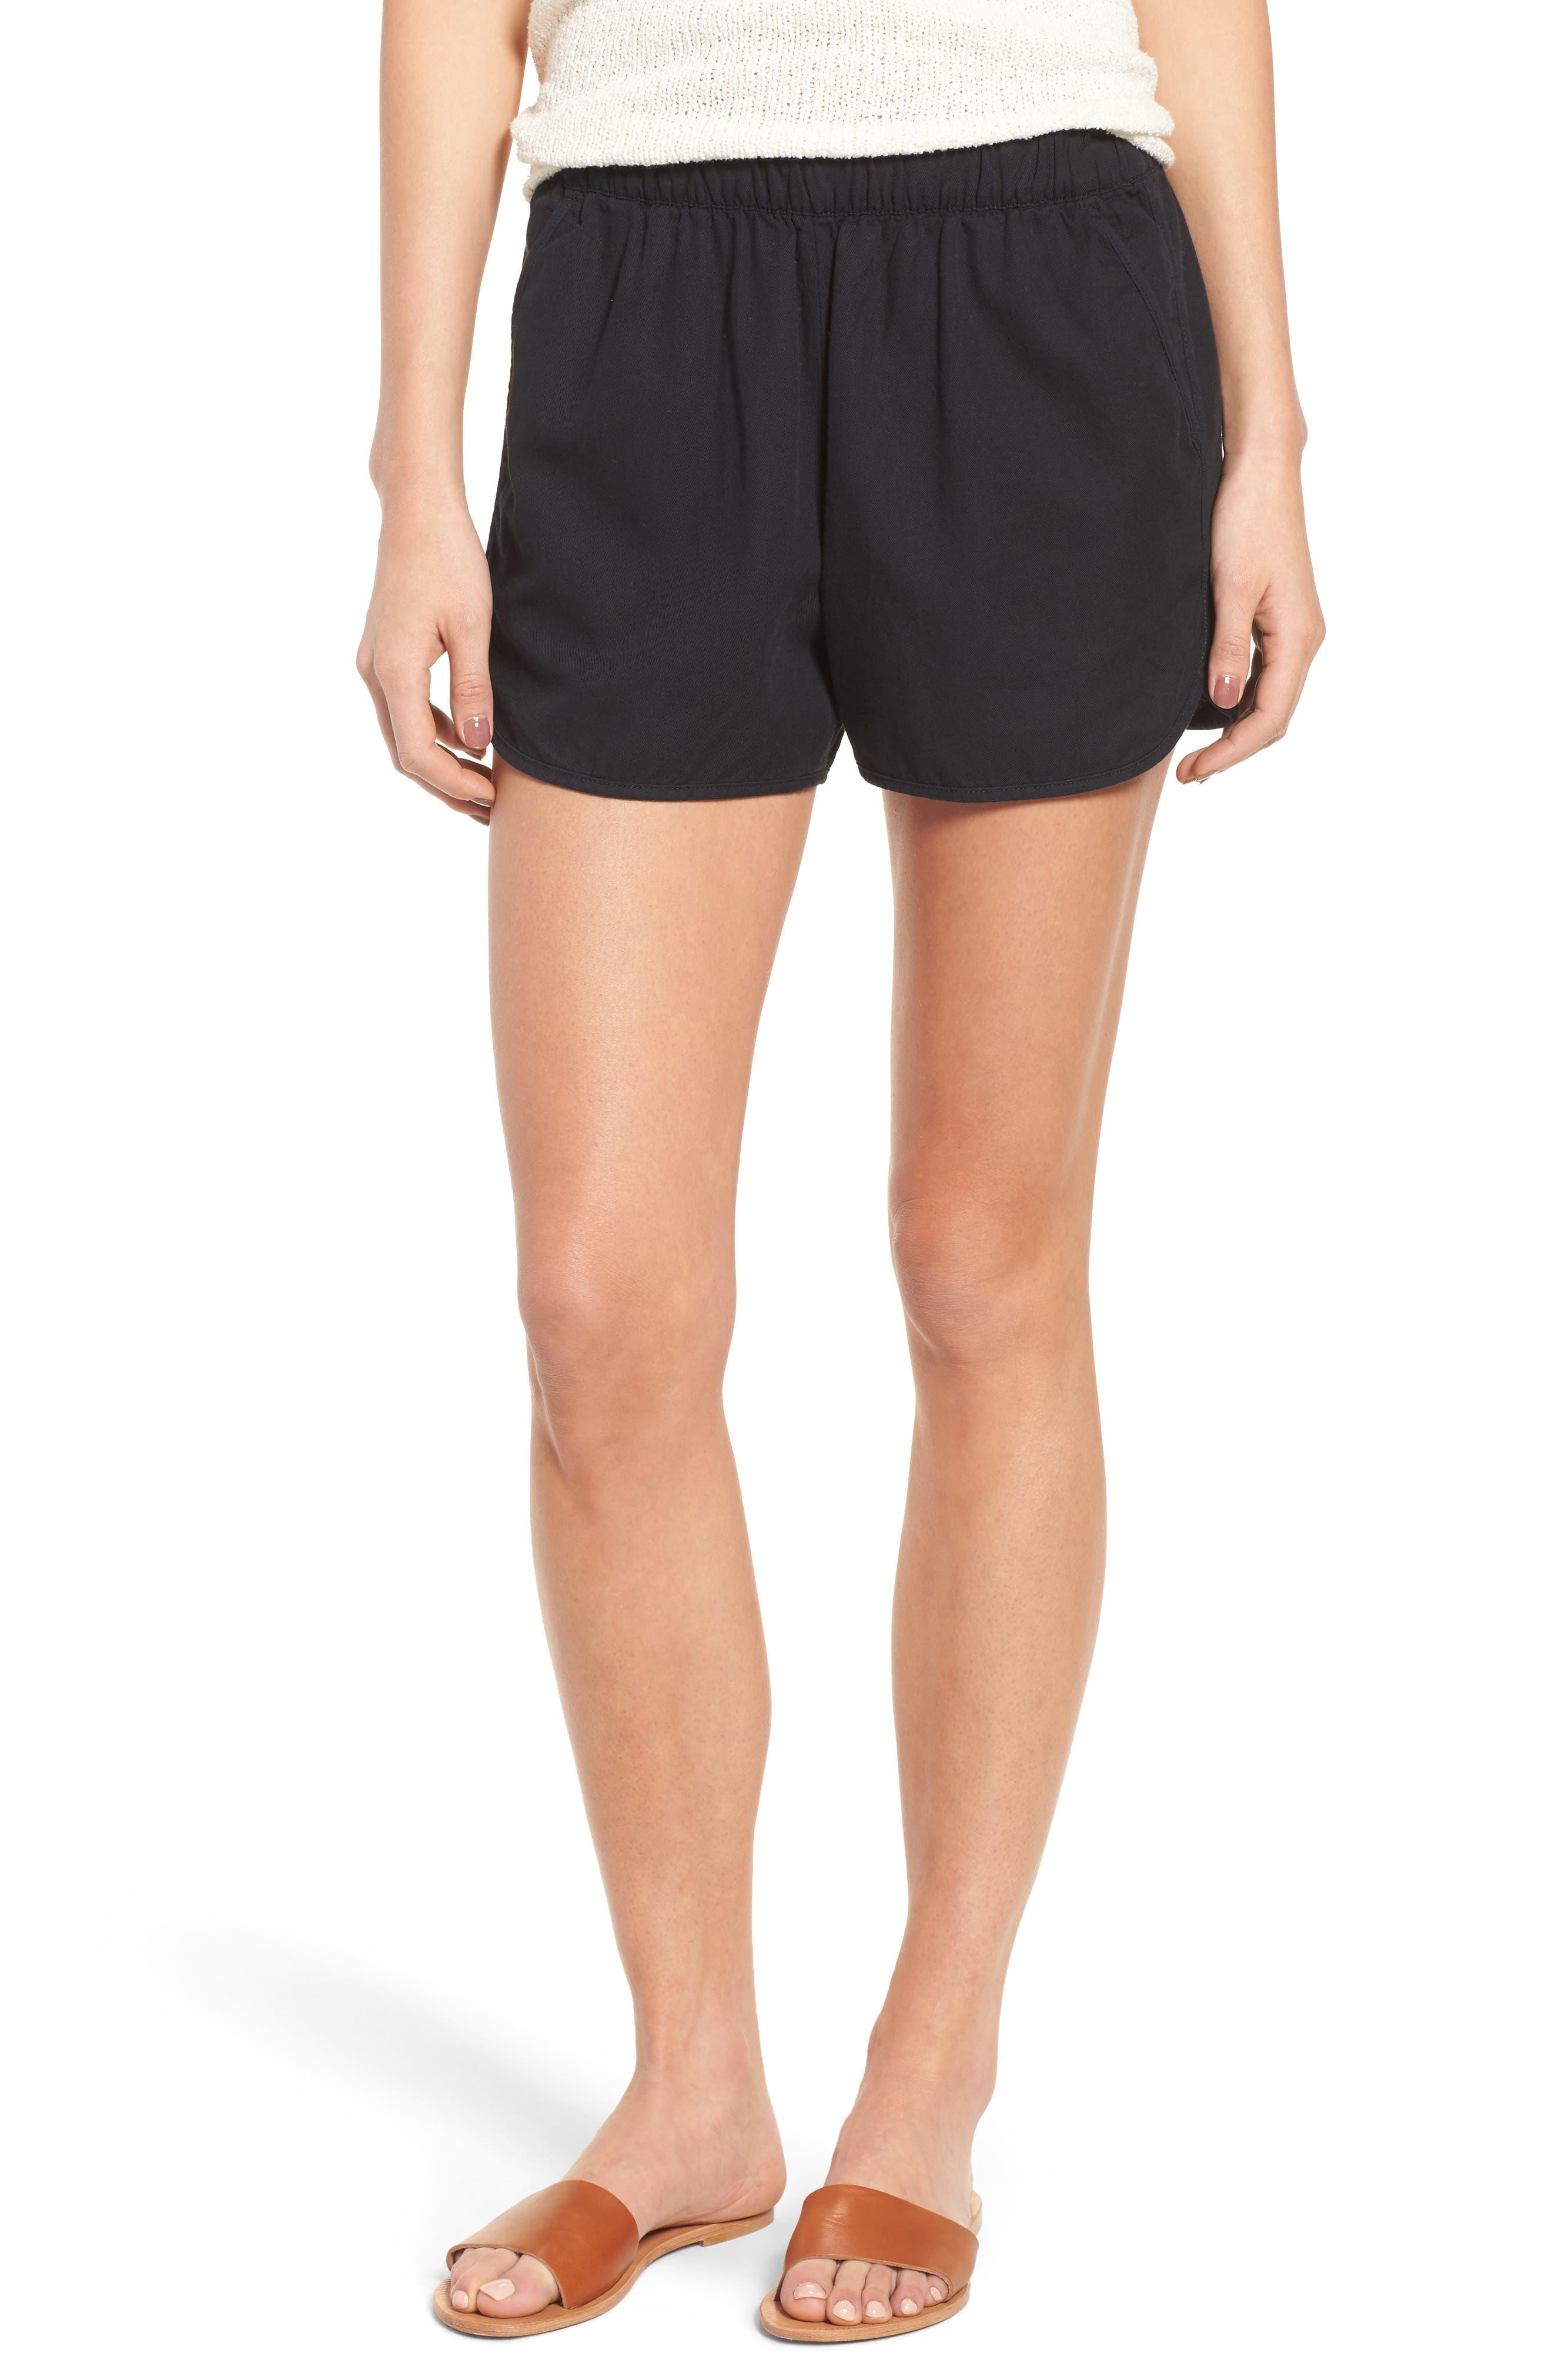 MADEWELL,                             Pull-On Shorts,                             Main thumbnail 1, color,                             001